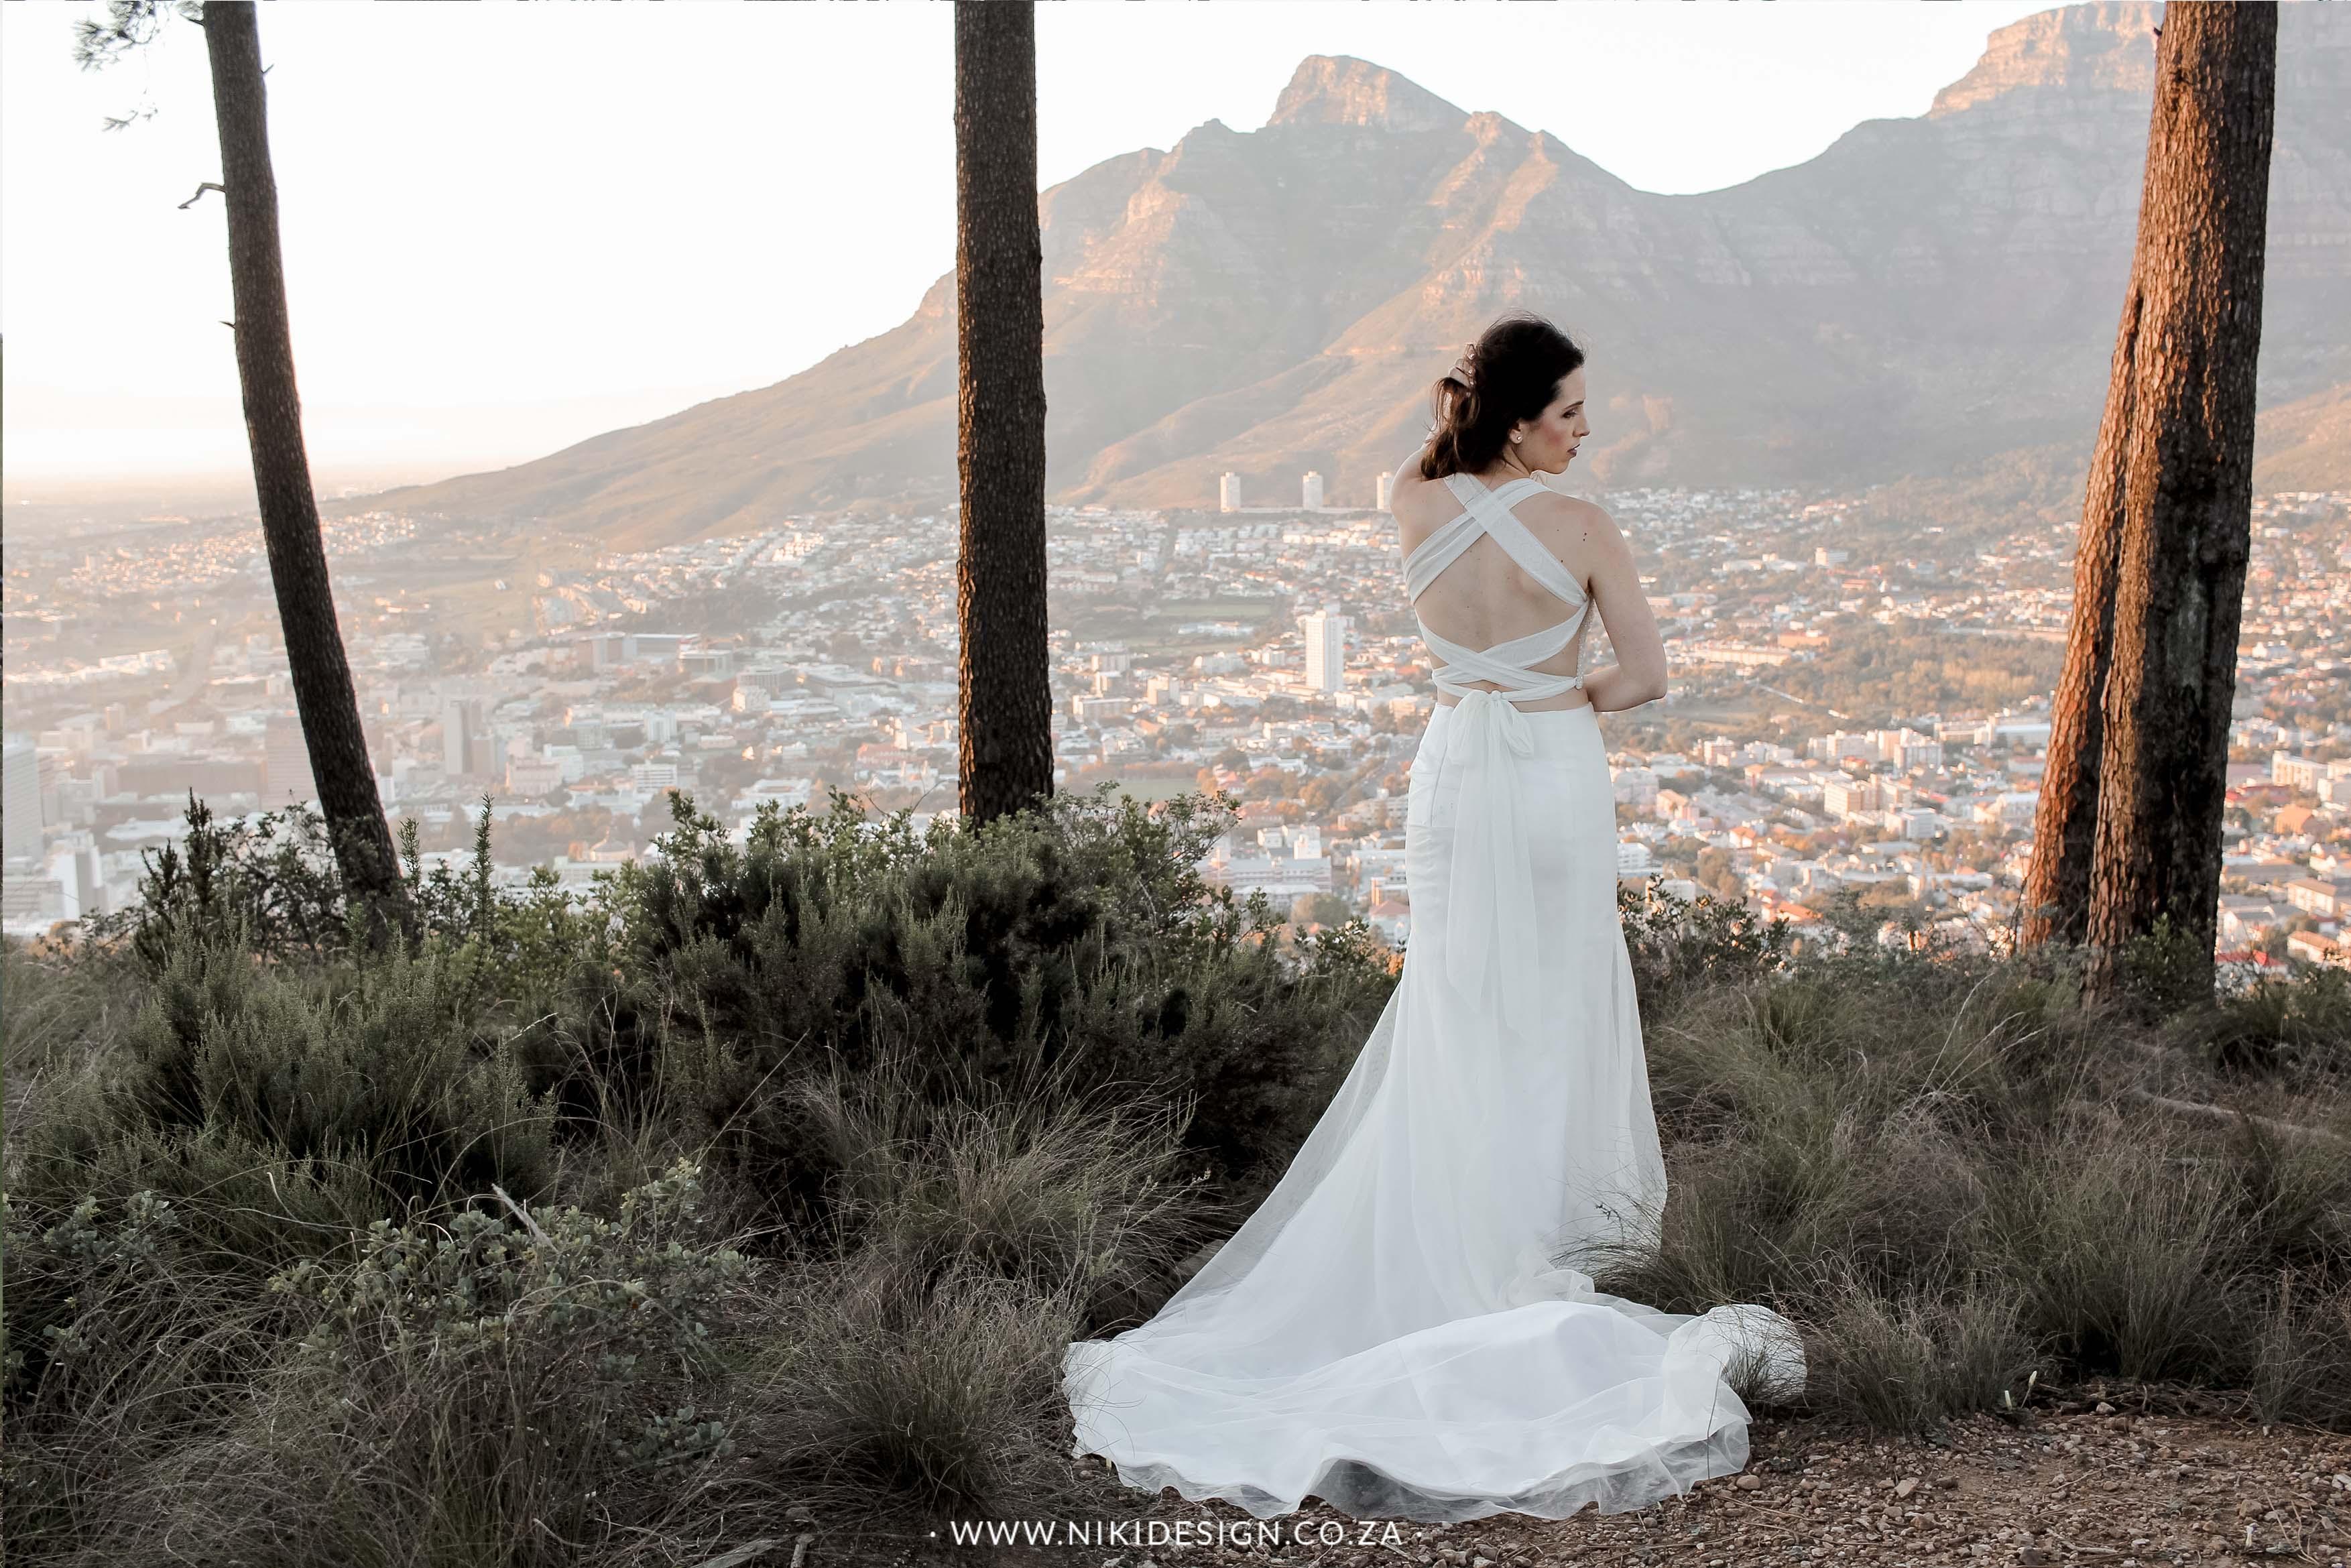 NikiDesign Studio Table Mountain wedding